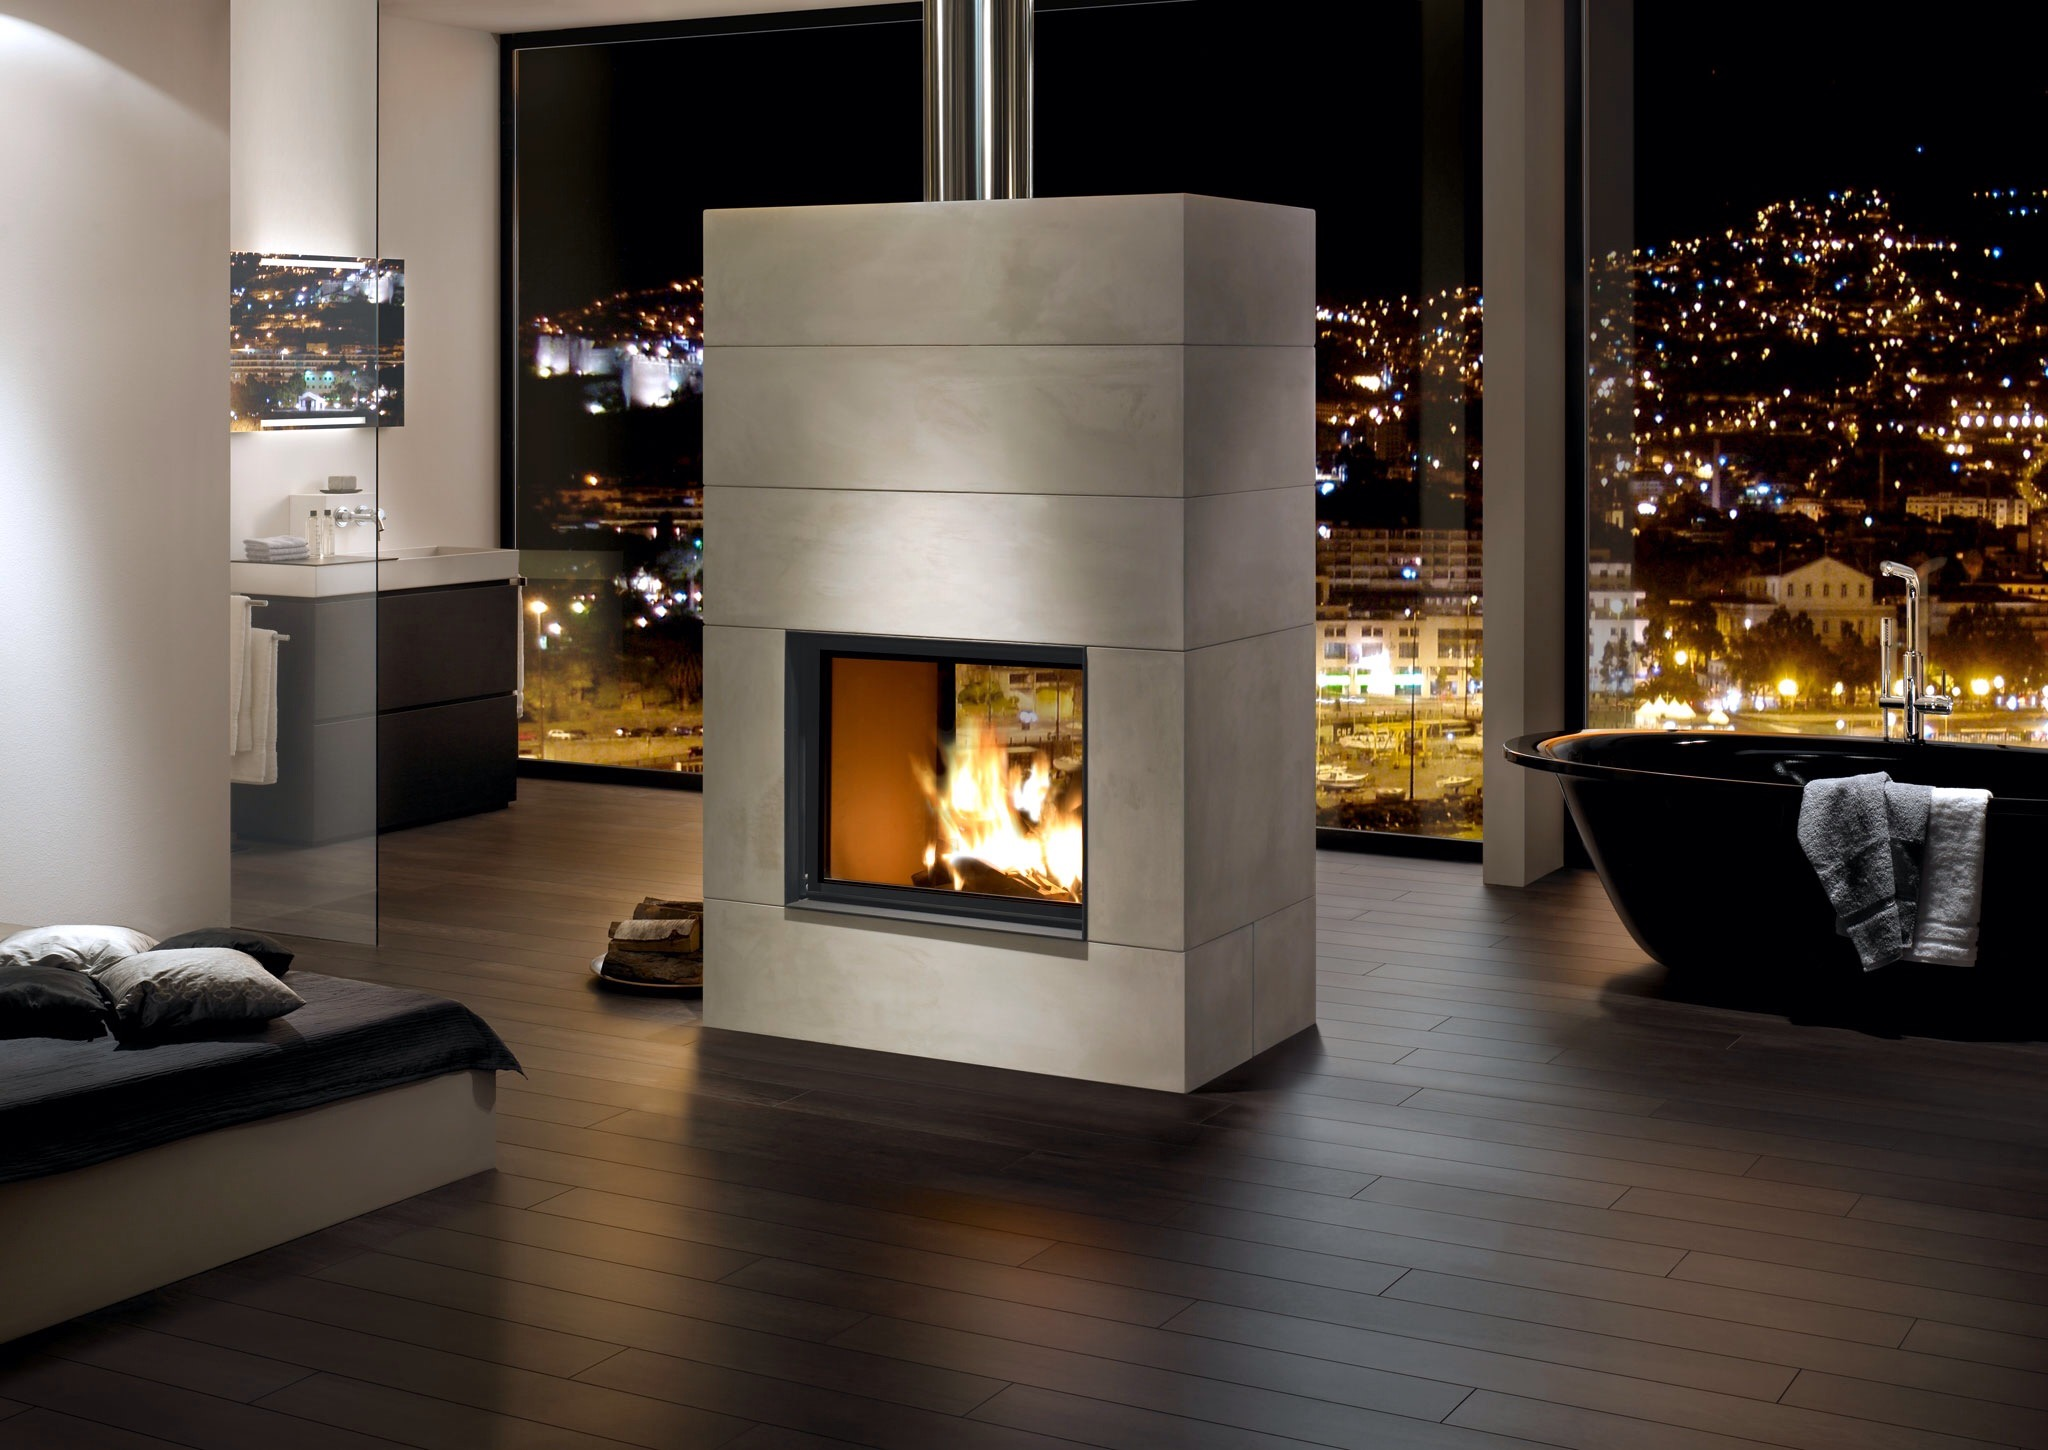 heizkamin brunner tunnelkamin 6757. Black Bedroom Furniture Sets. Home Design Ideas